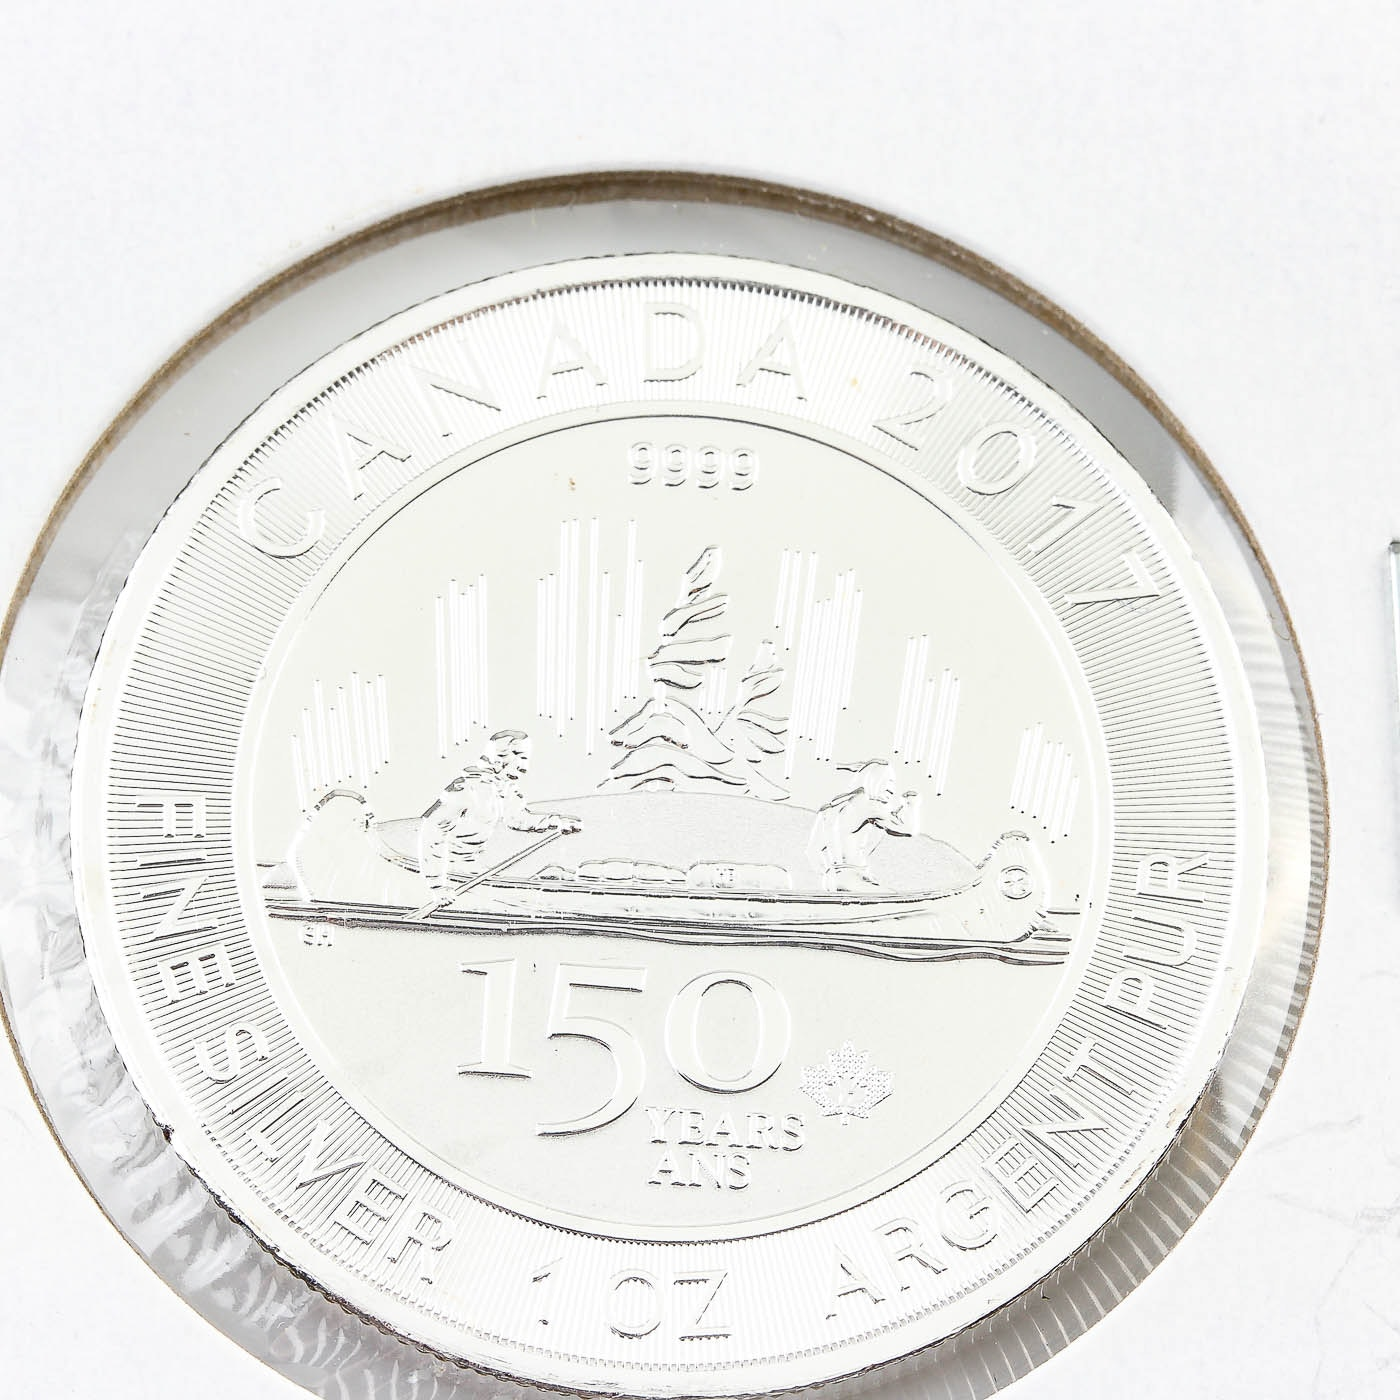 2017 Canadian 150th Anniversary Commemorative $5 Maple Leaf Silver Bullion Coin